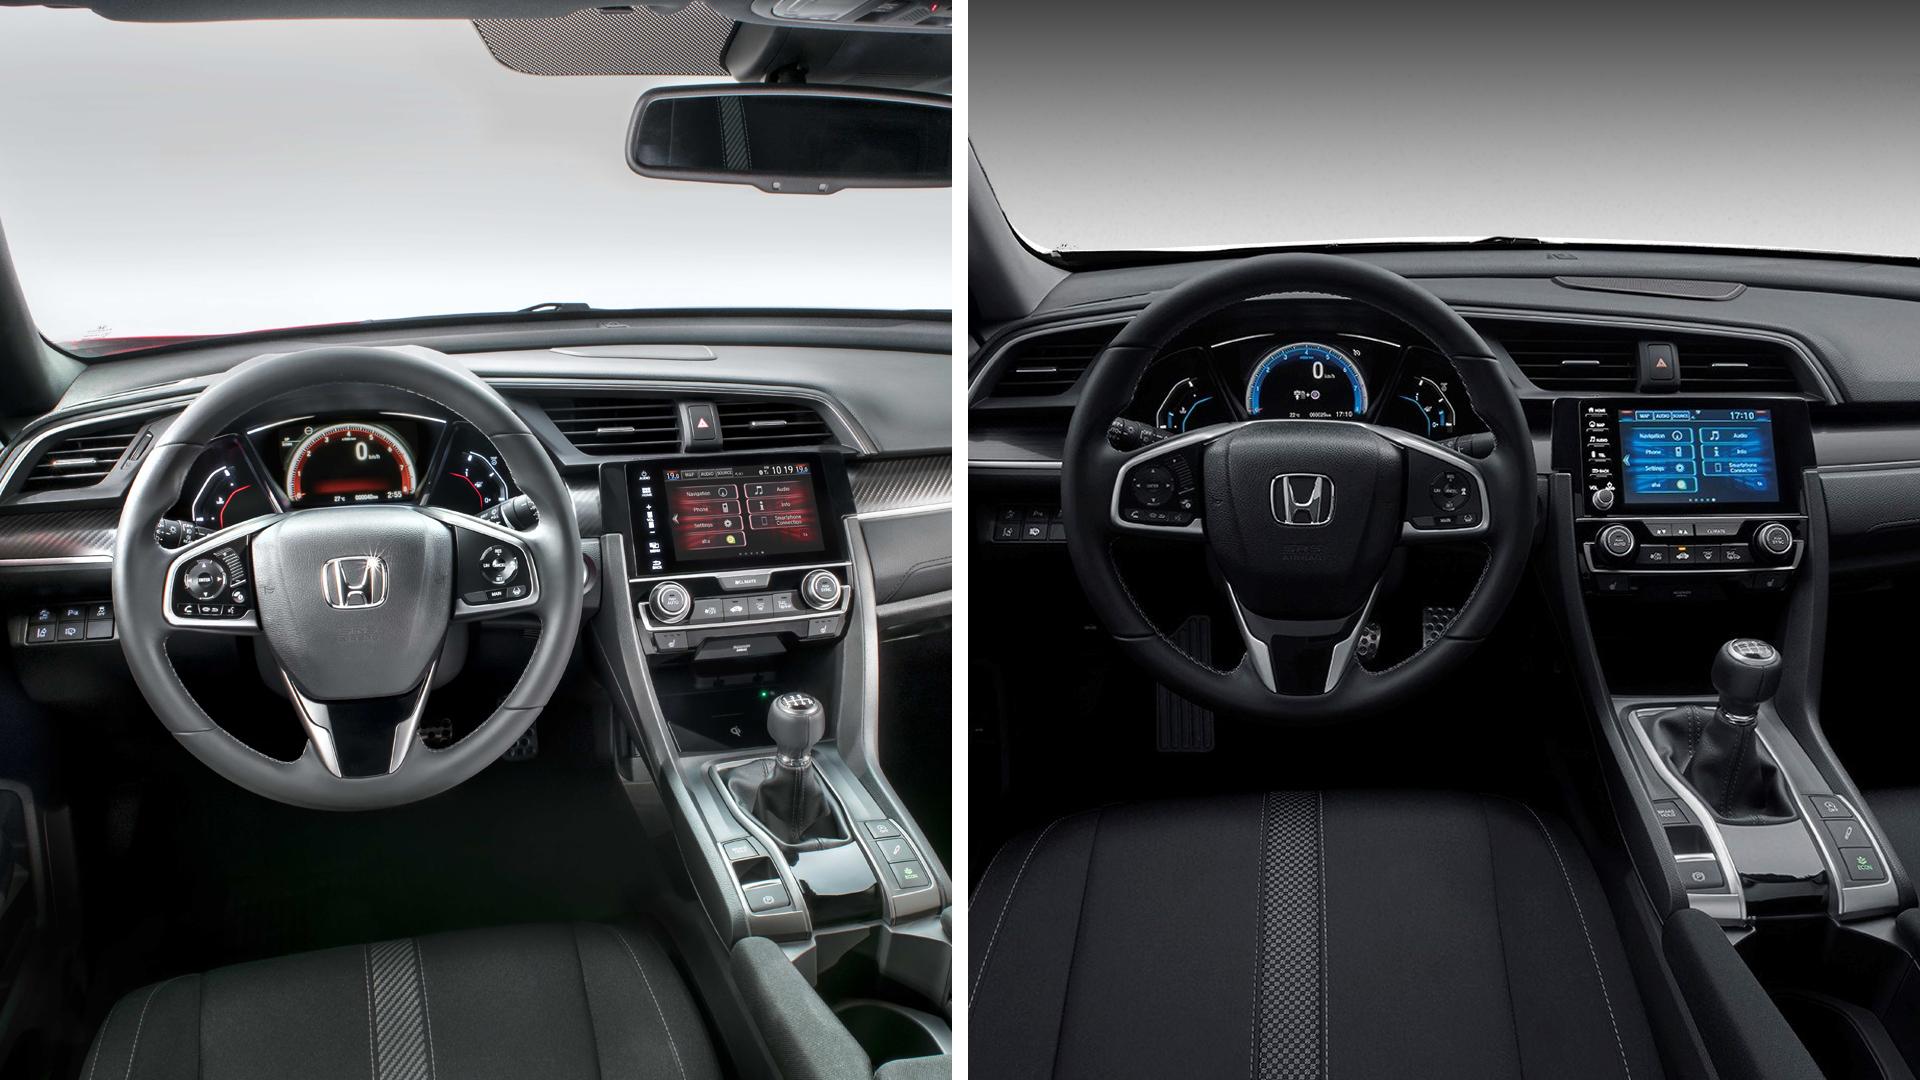 Honda Civic EU